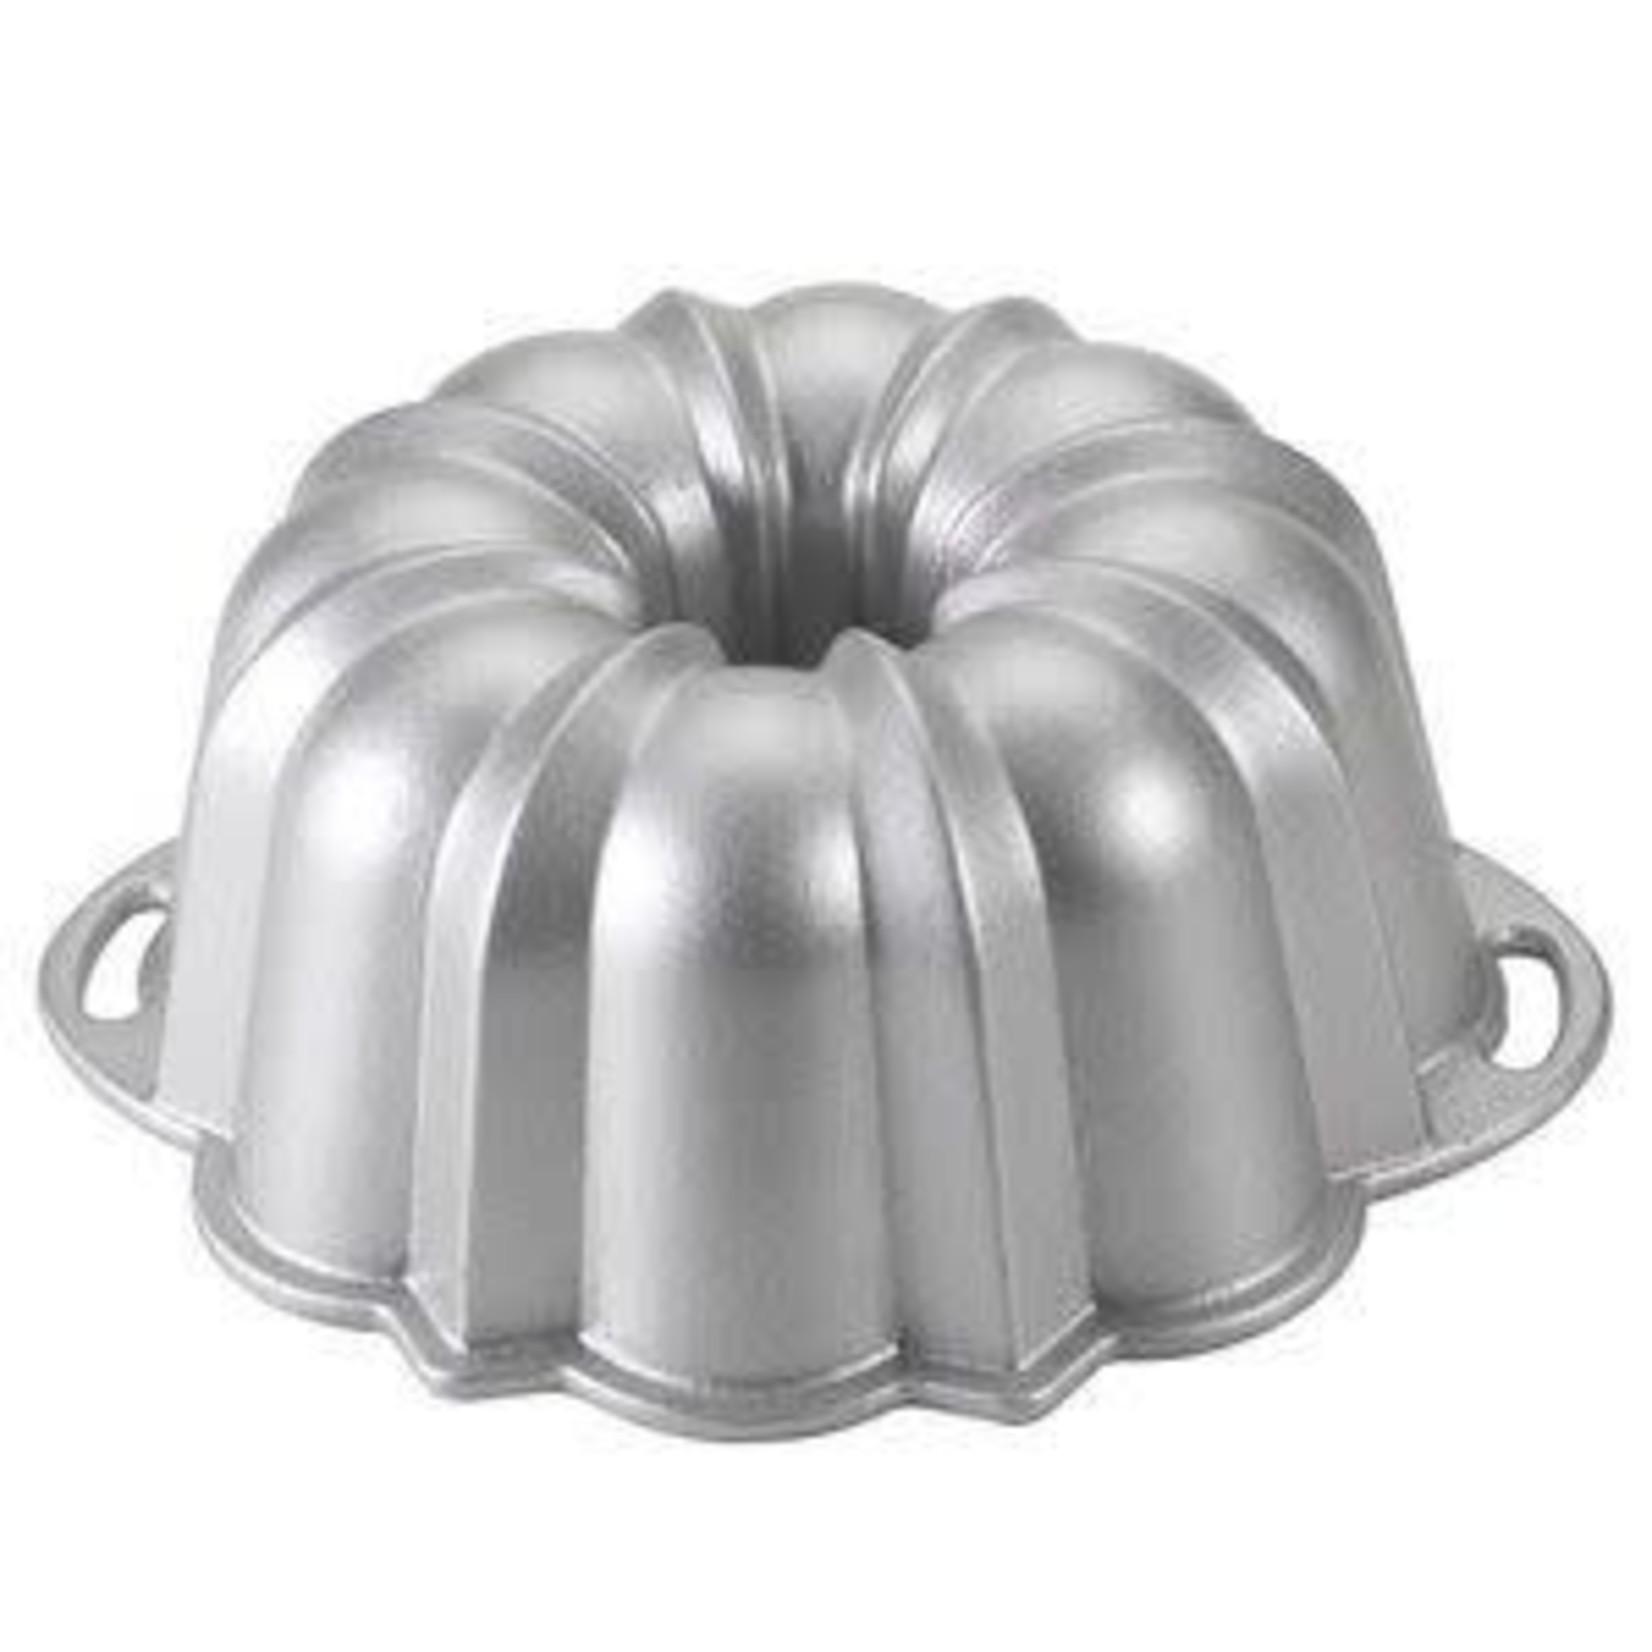 Nordicware ANNIVERSARY BUNDT PAN 12 CUP